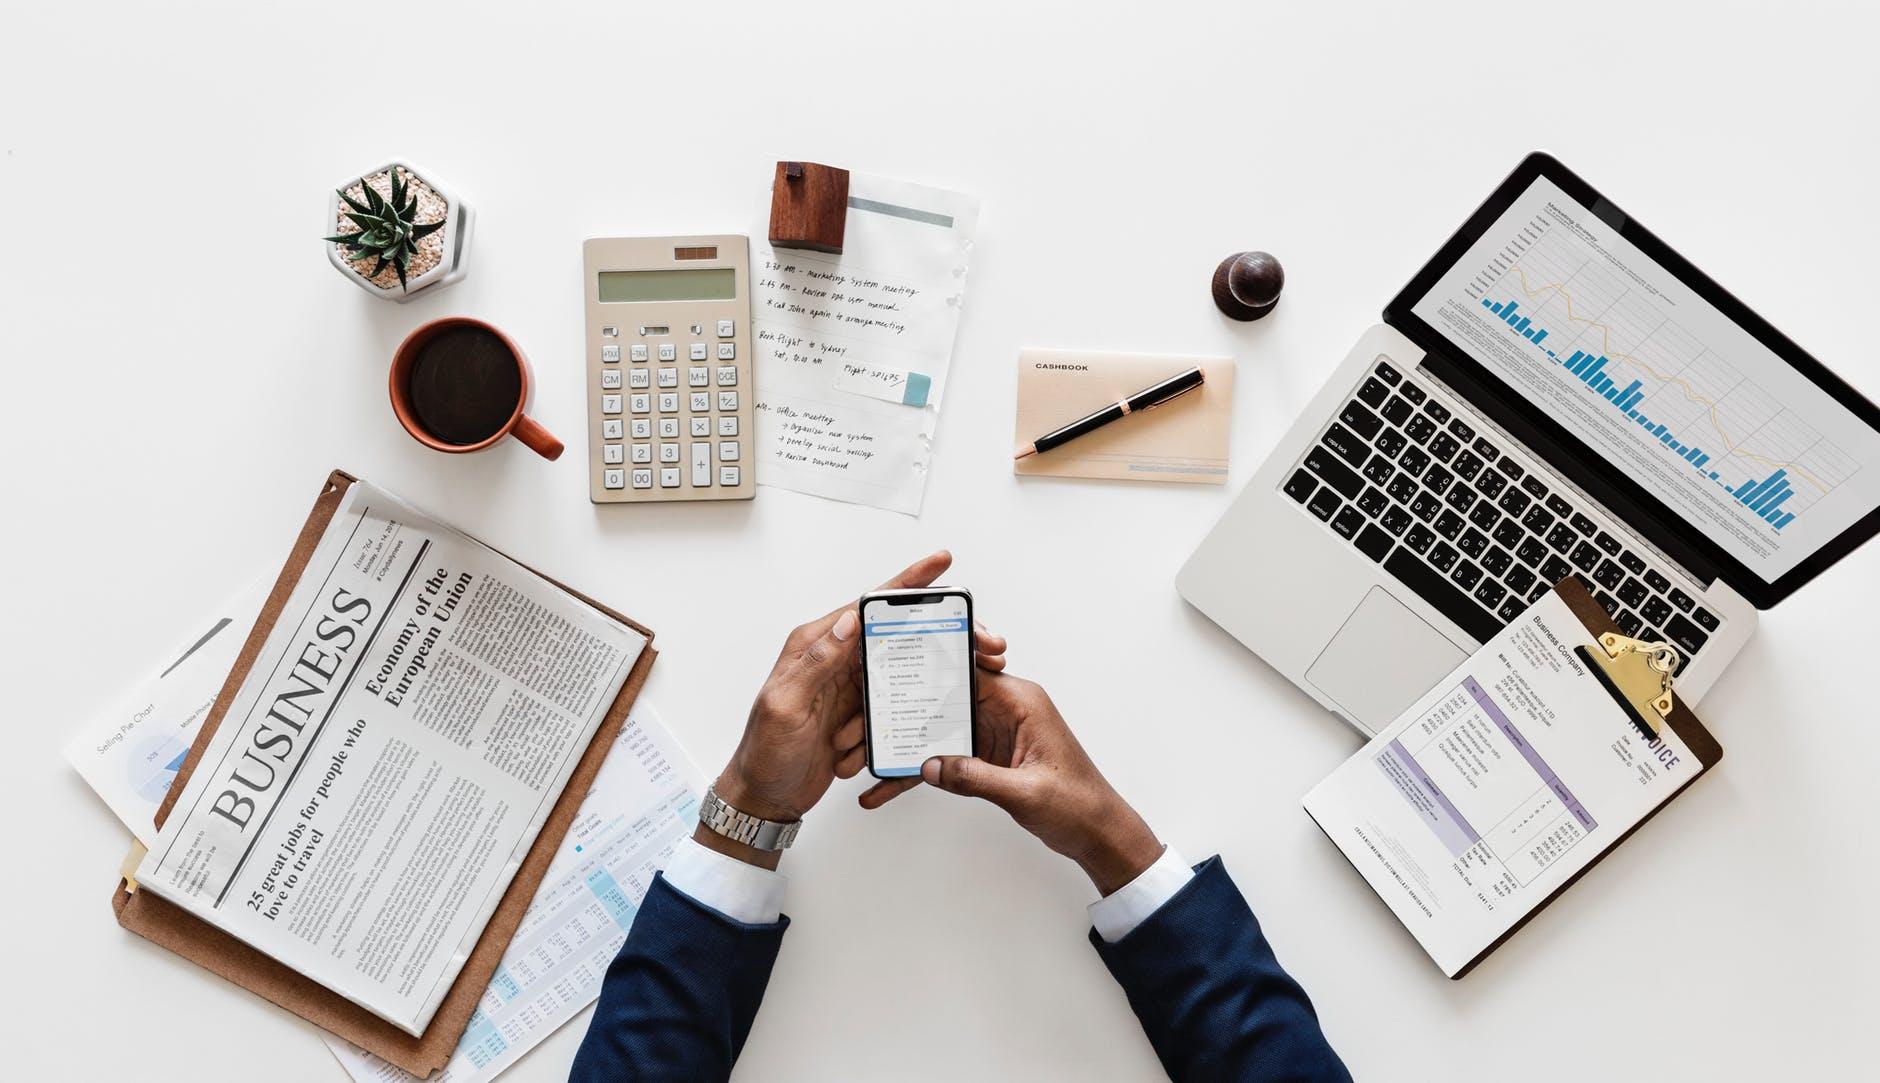 large business loan calculator